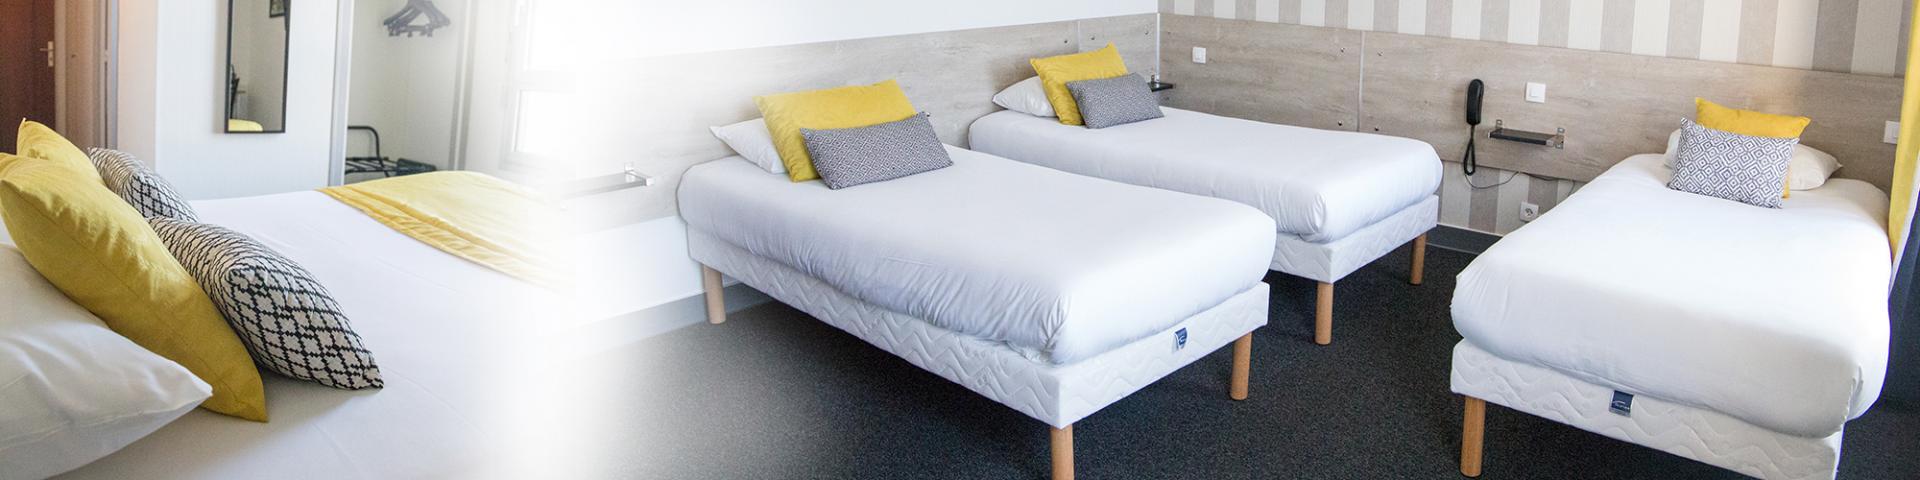 Hotelstantoine2